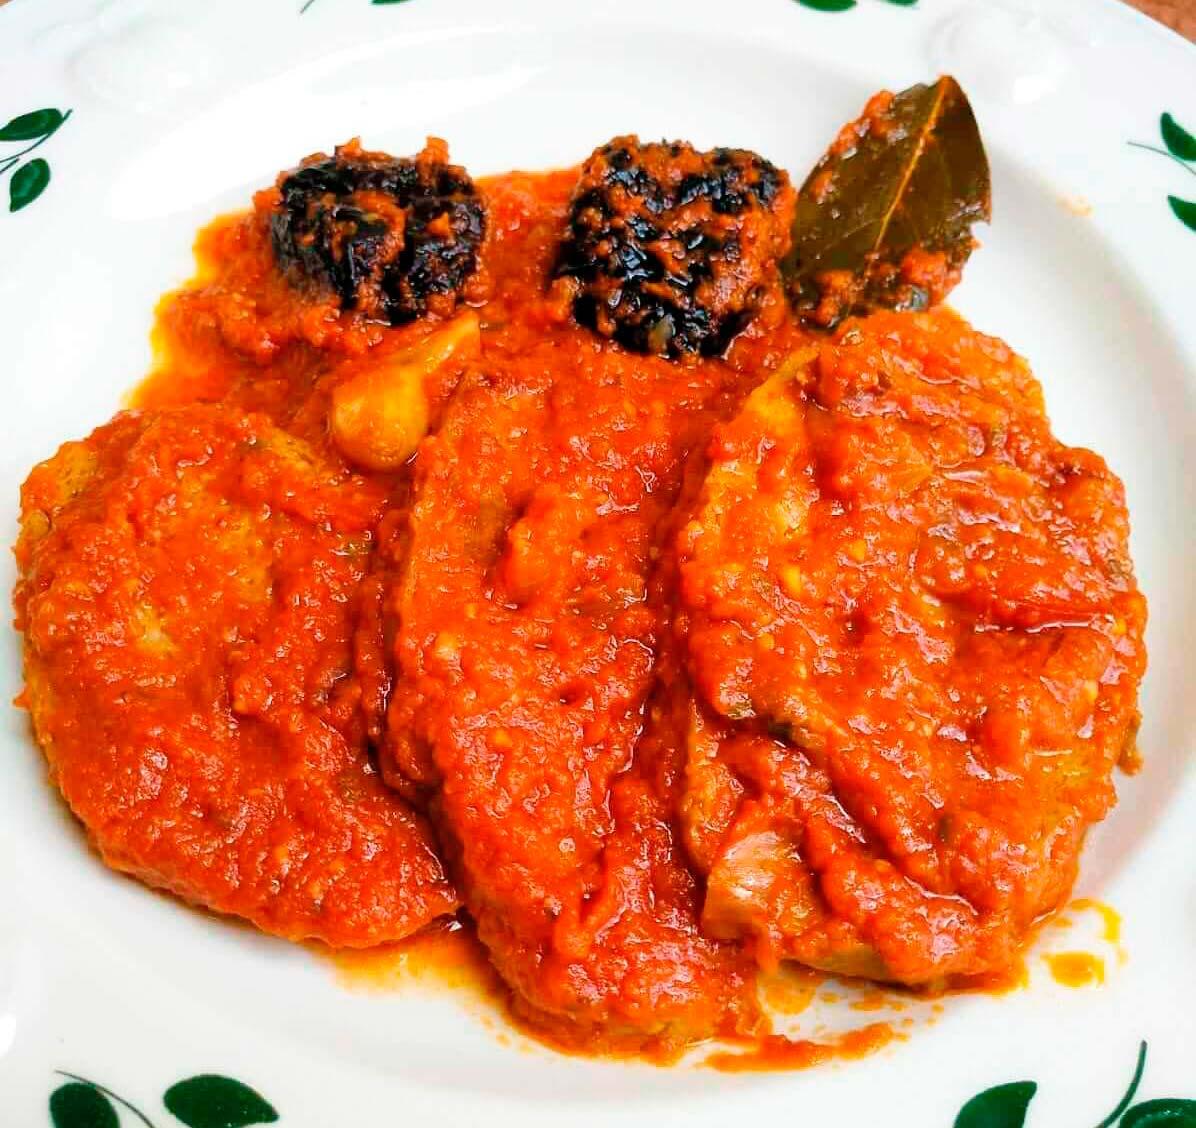 Receta Seitán con salsa de tomate y ciruelas